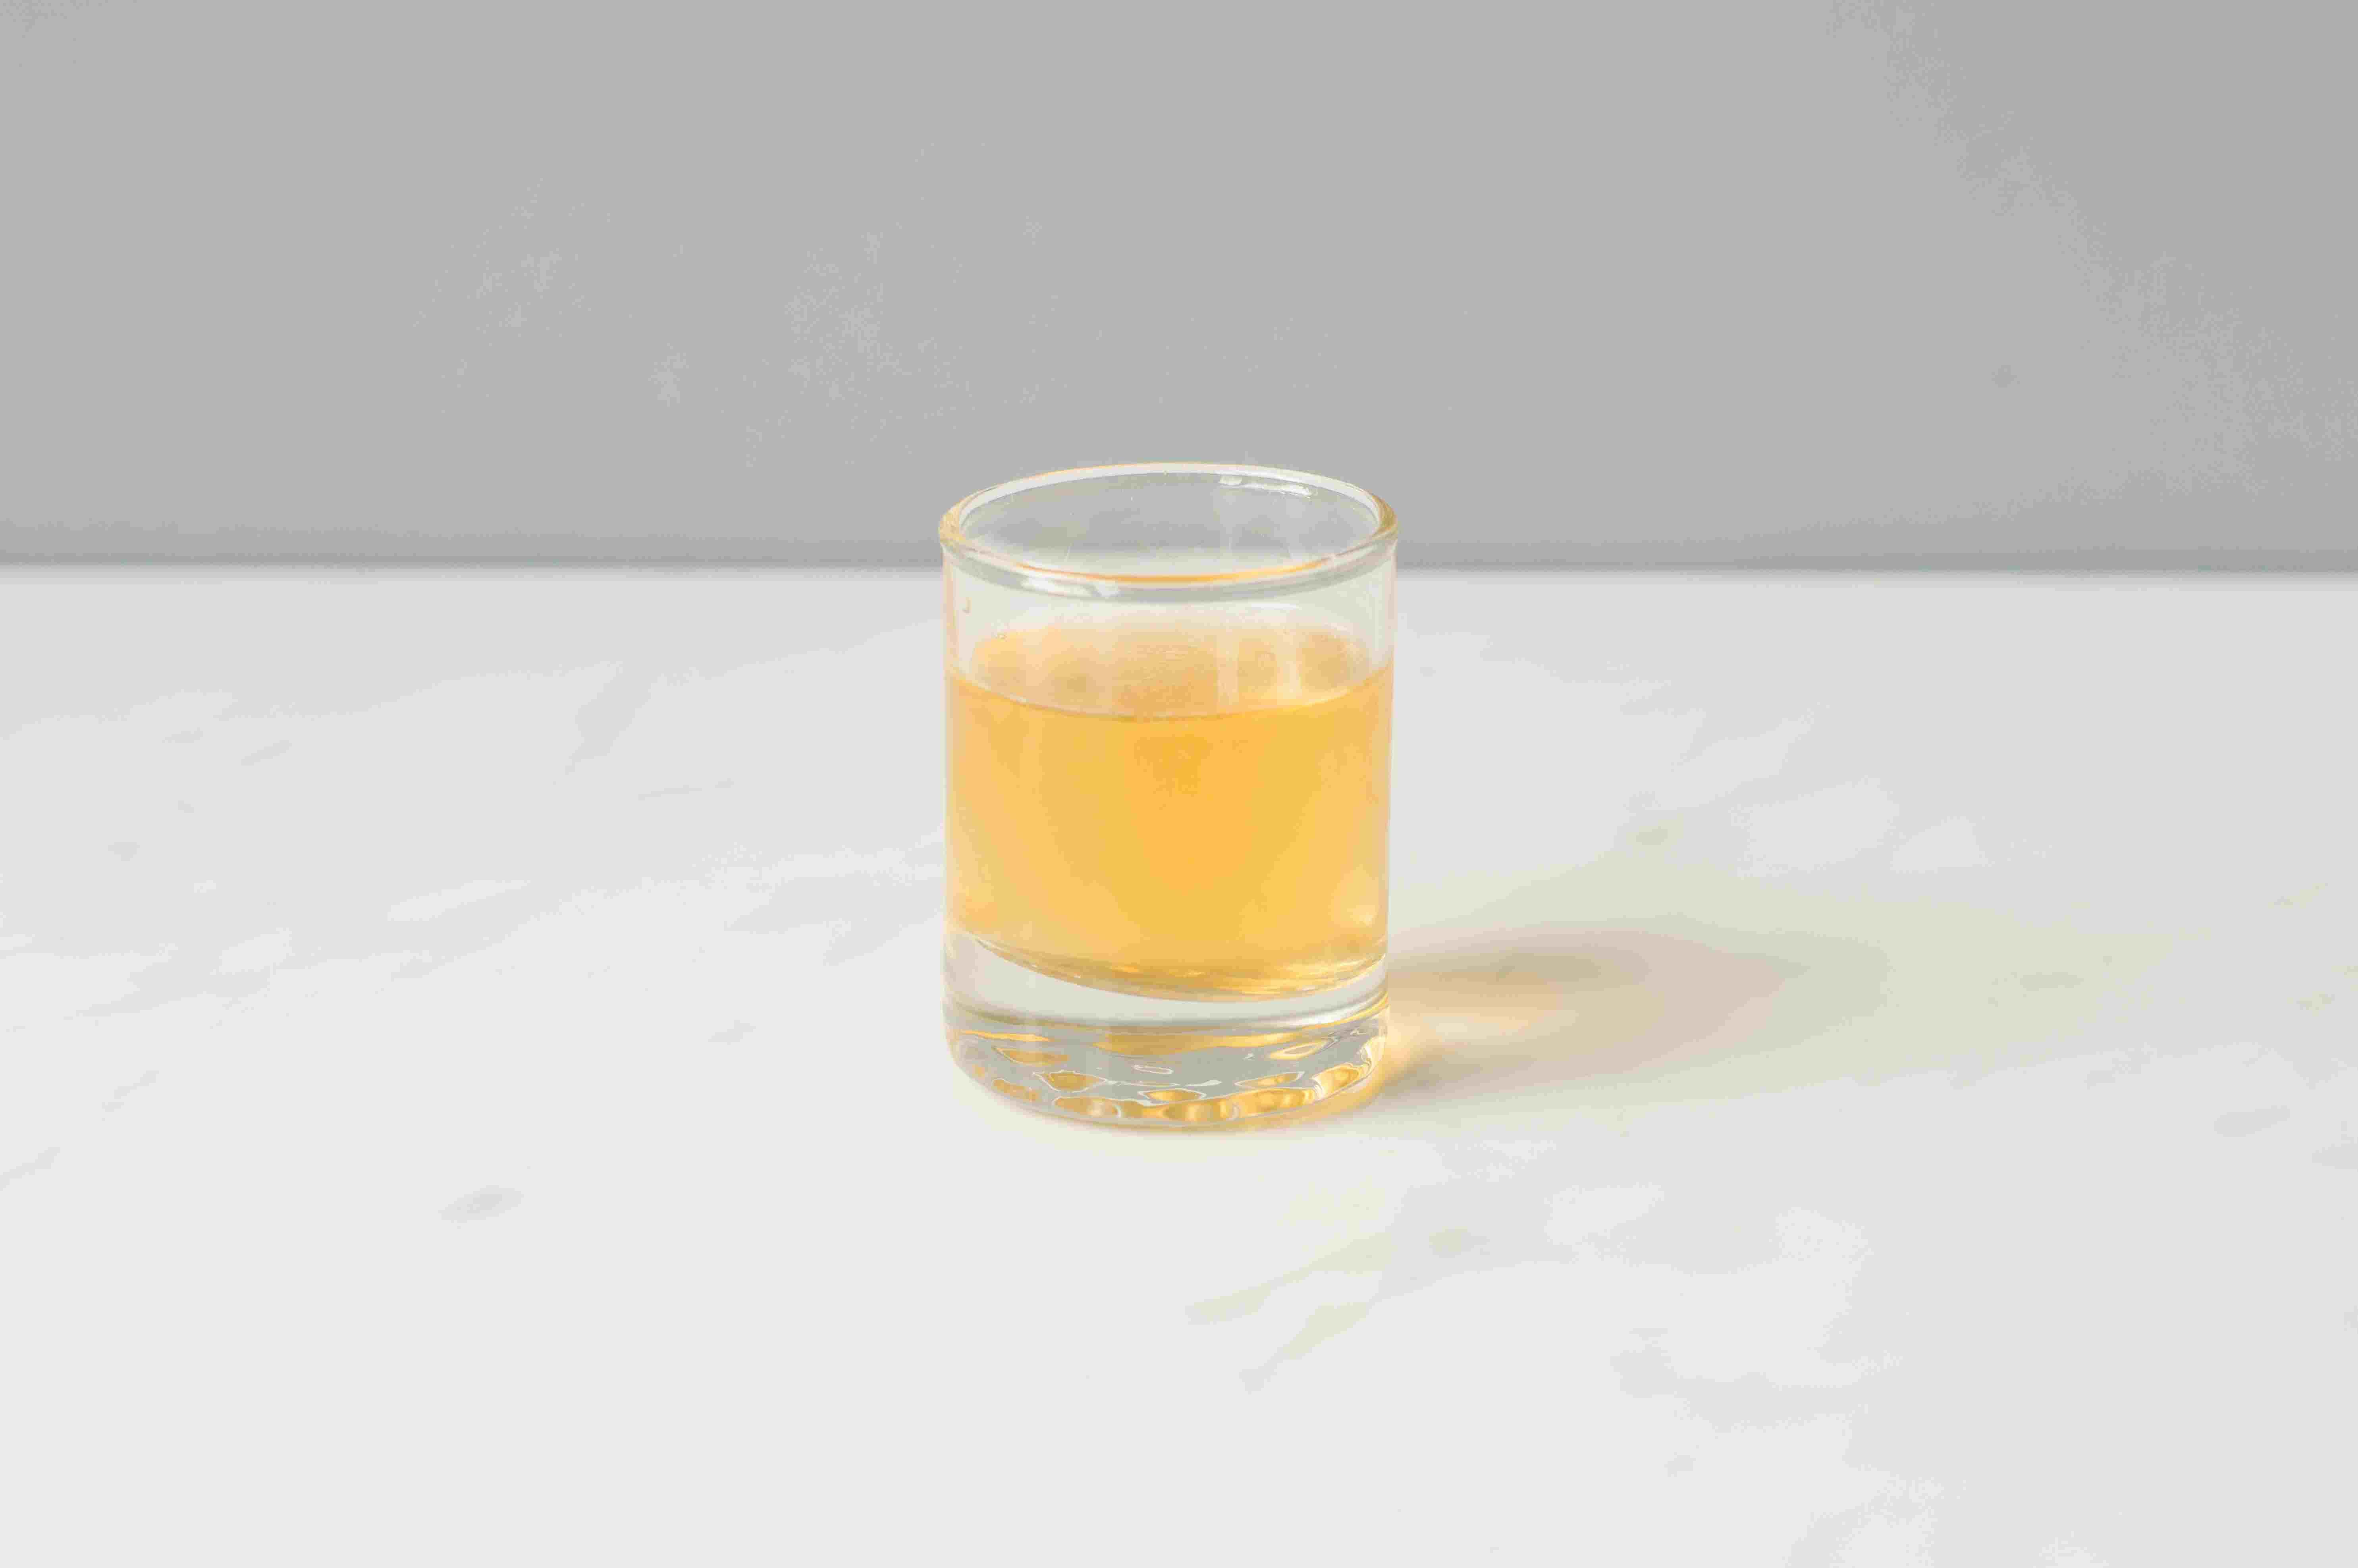 Strain into a shot glass